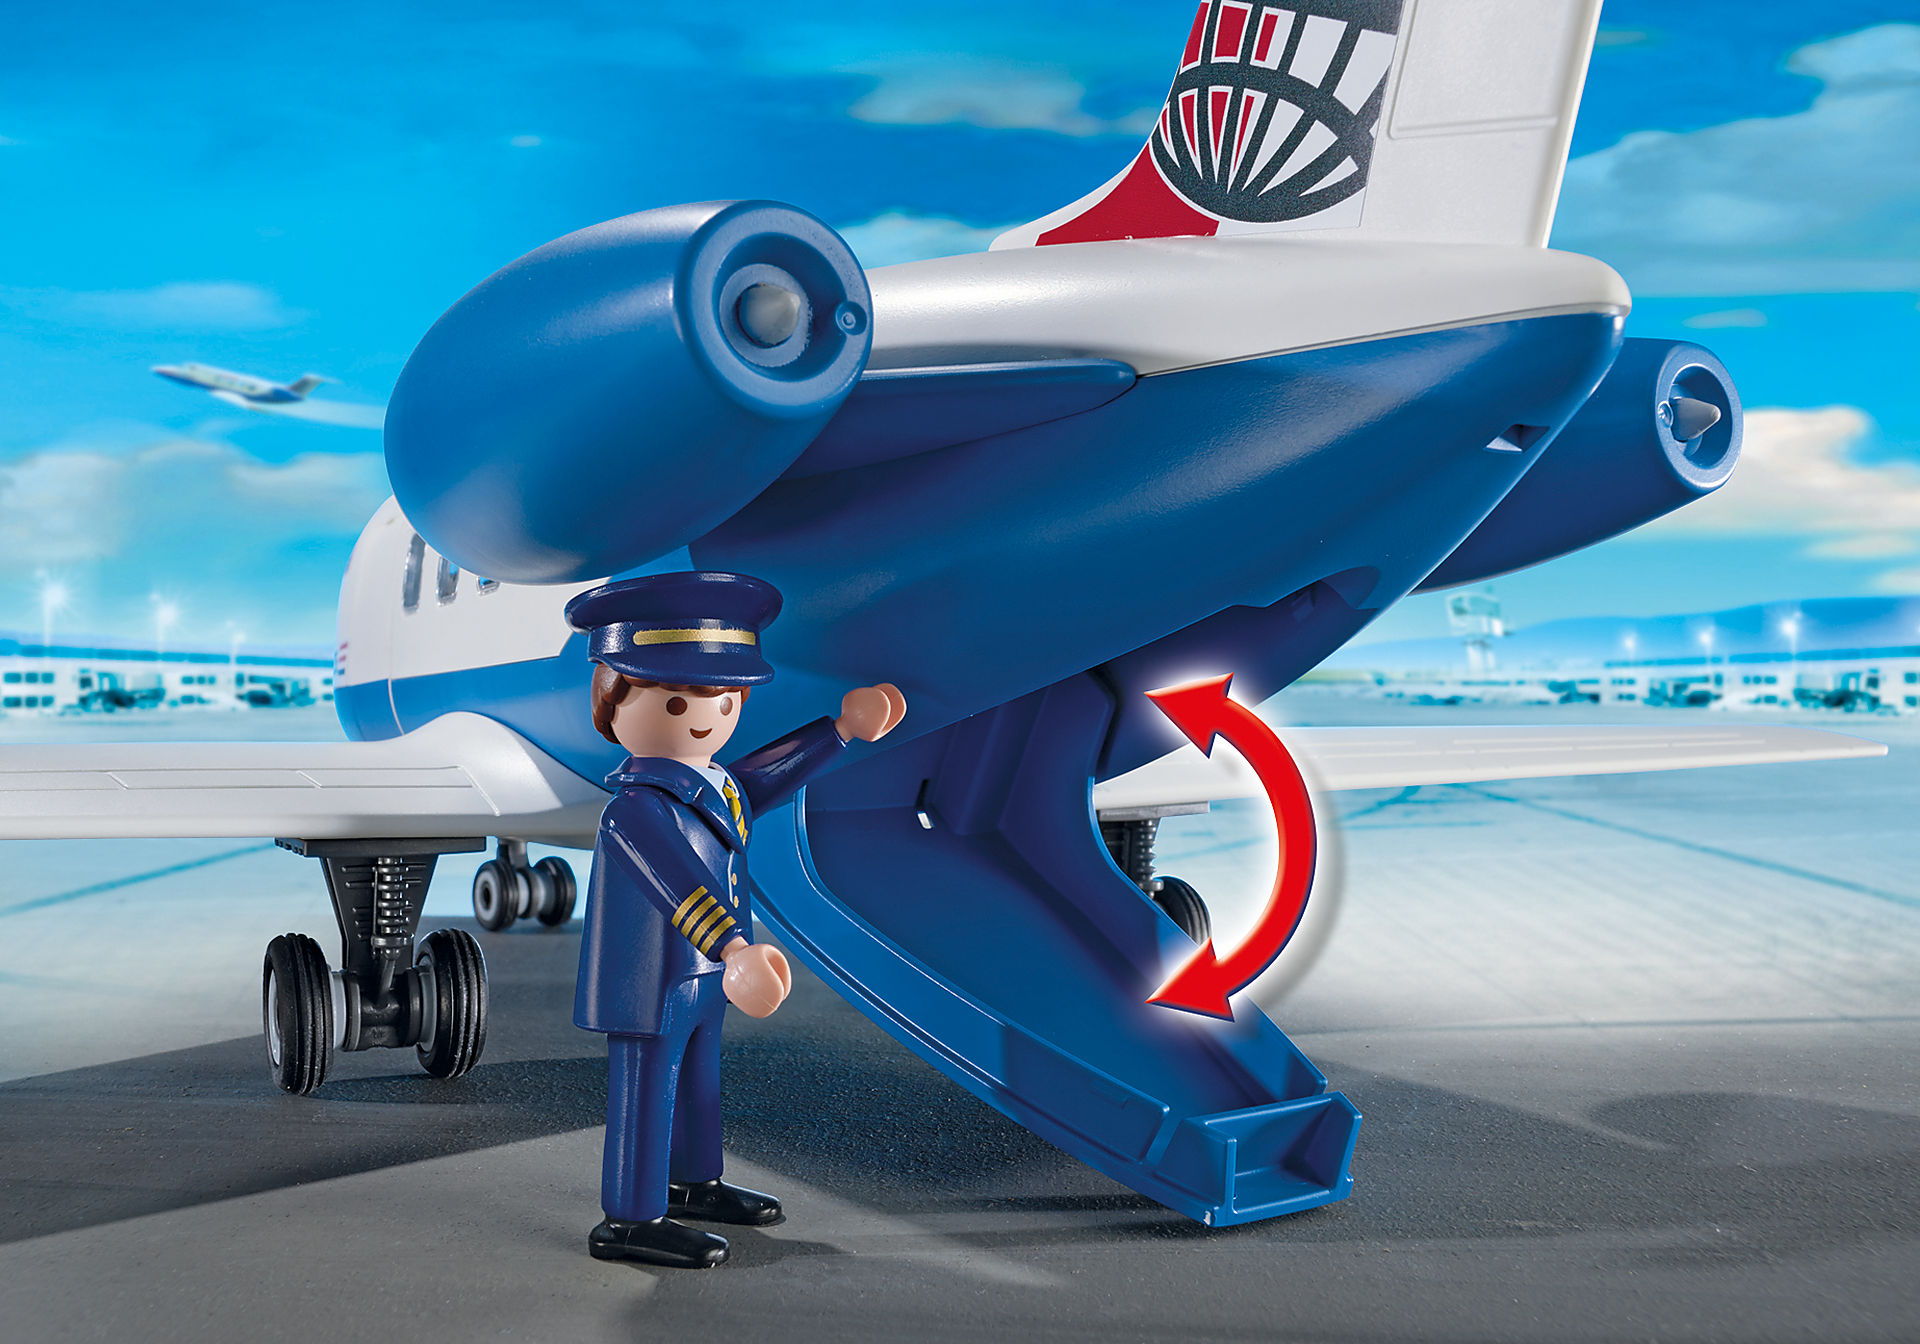 http://media.playmobil.com/i/playmobil/5395_product_extra1/Avión de Pasajeros